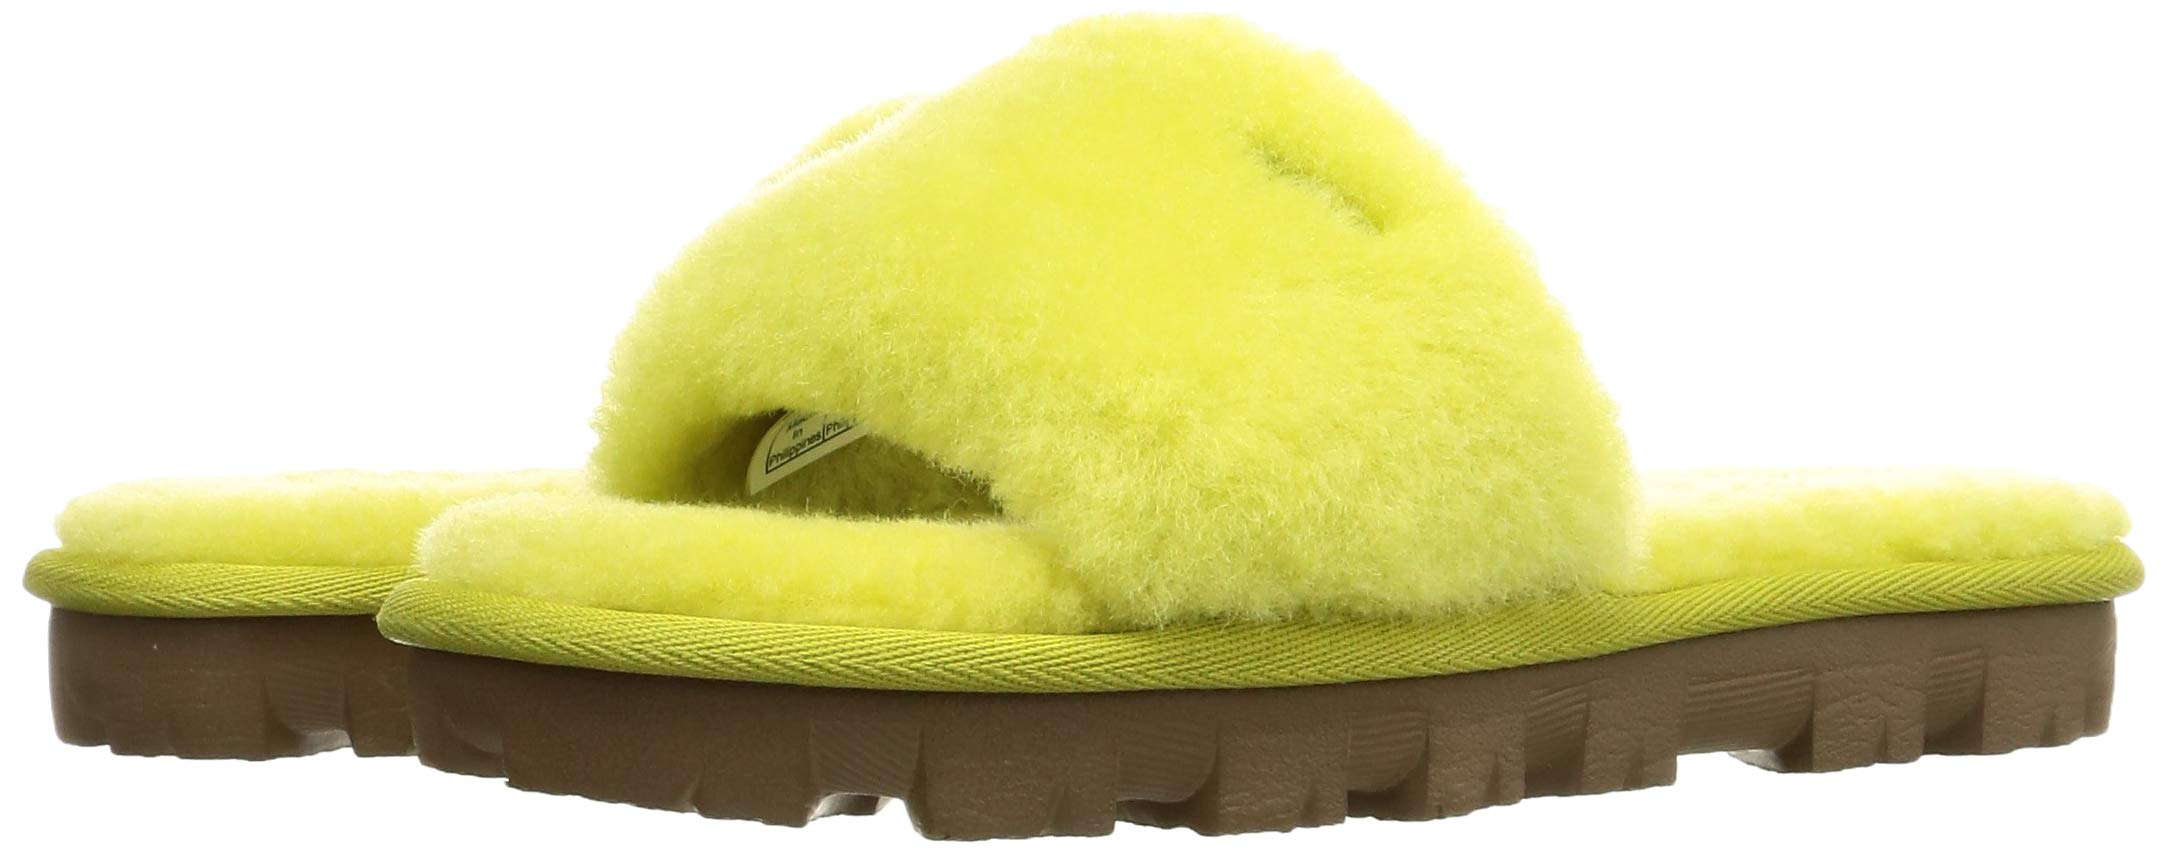 cozette slipper